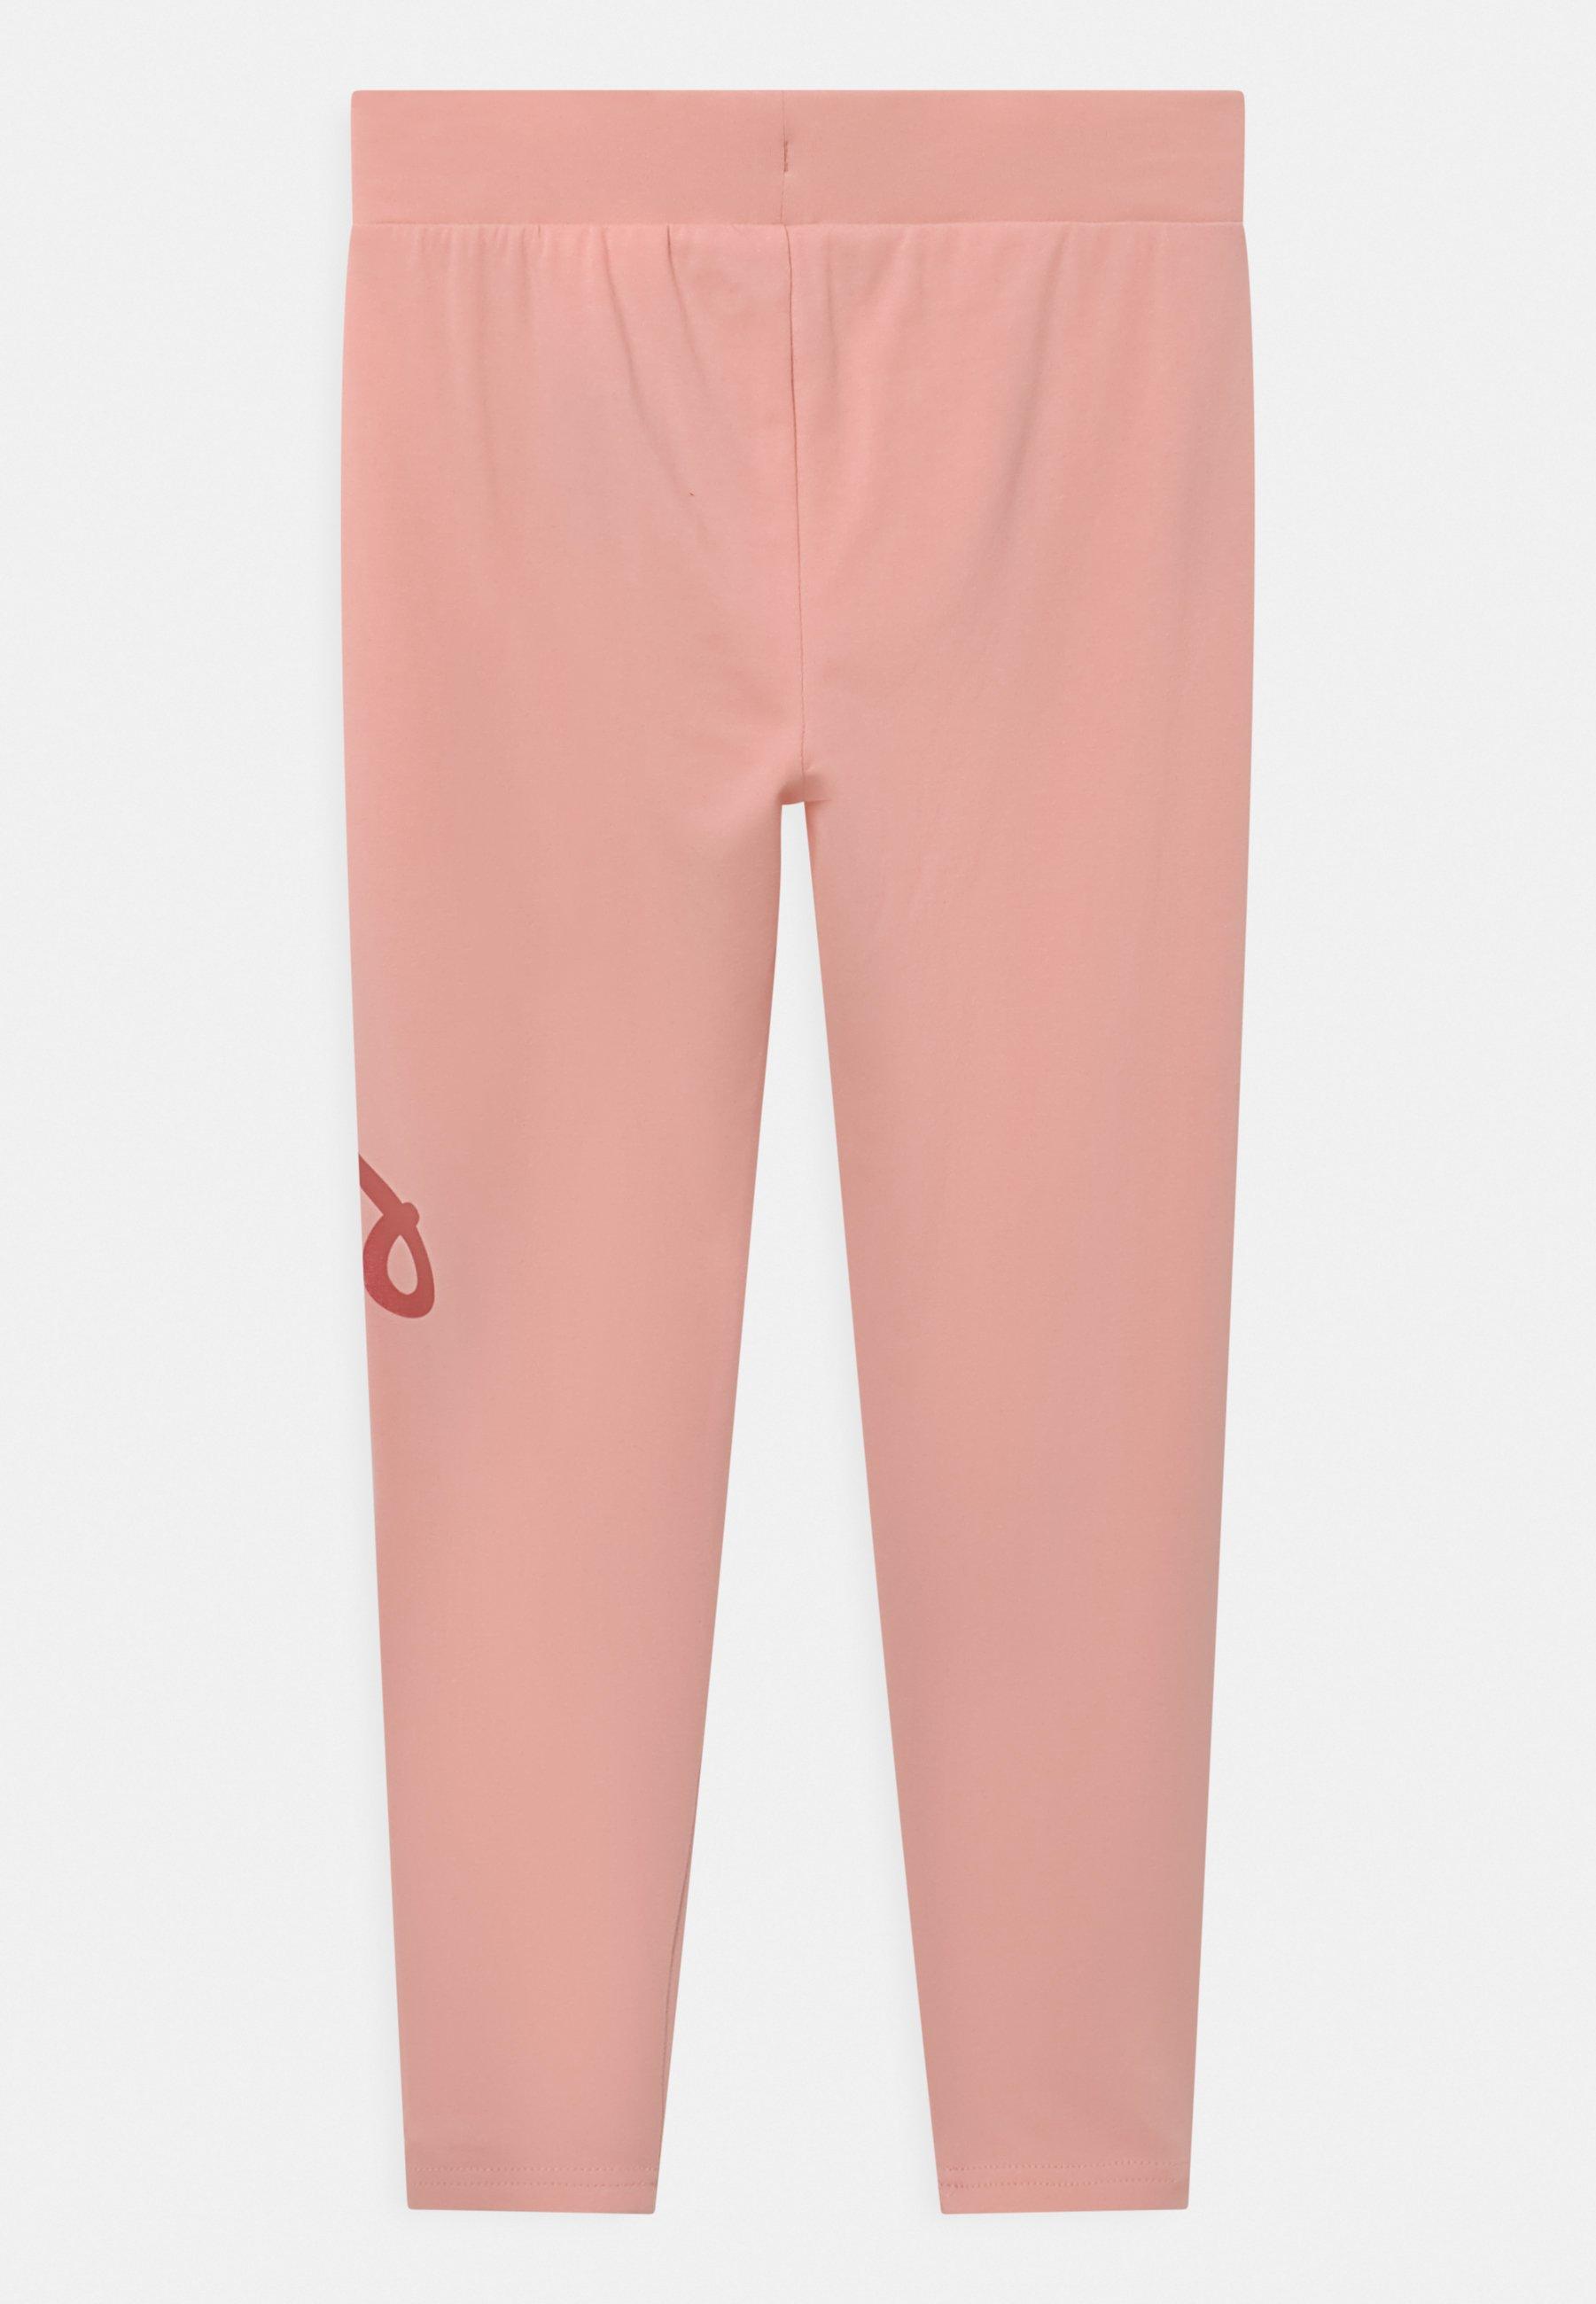 Kids CHUCK TAYLOR SCRIPT SHINE - Leggings - Trousers